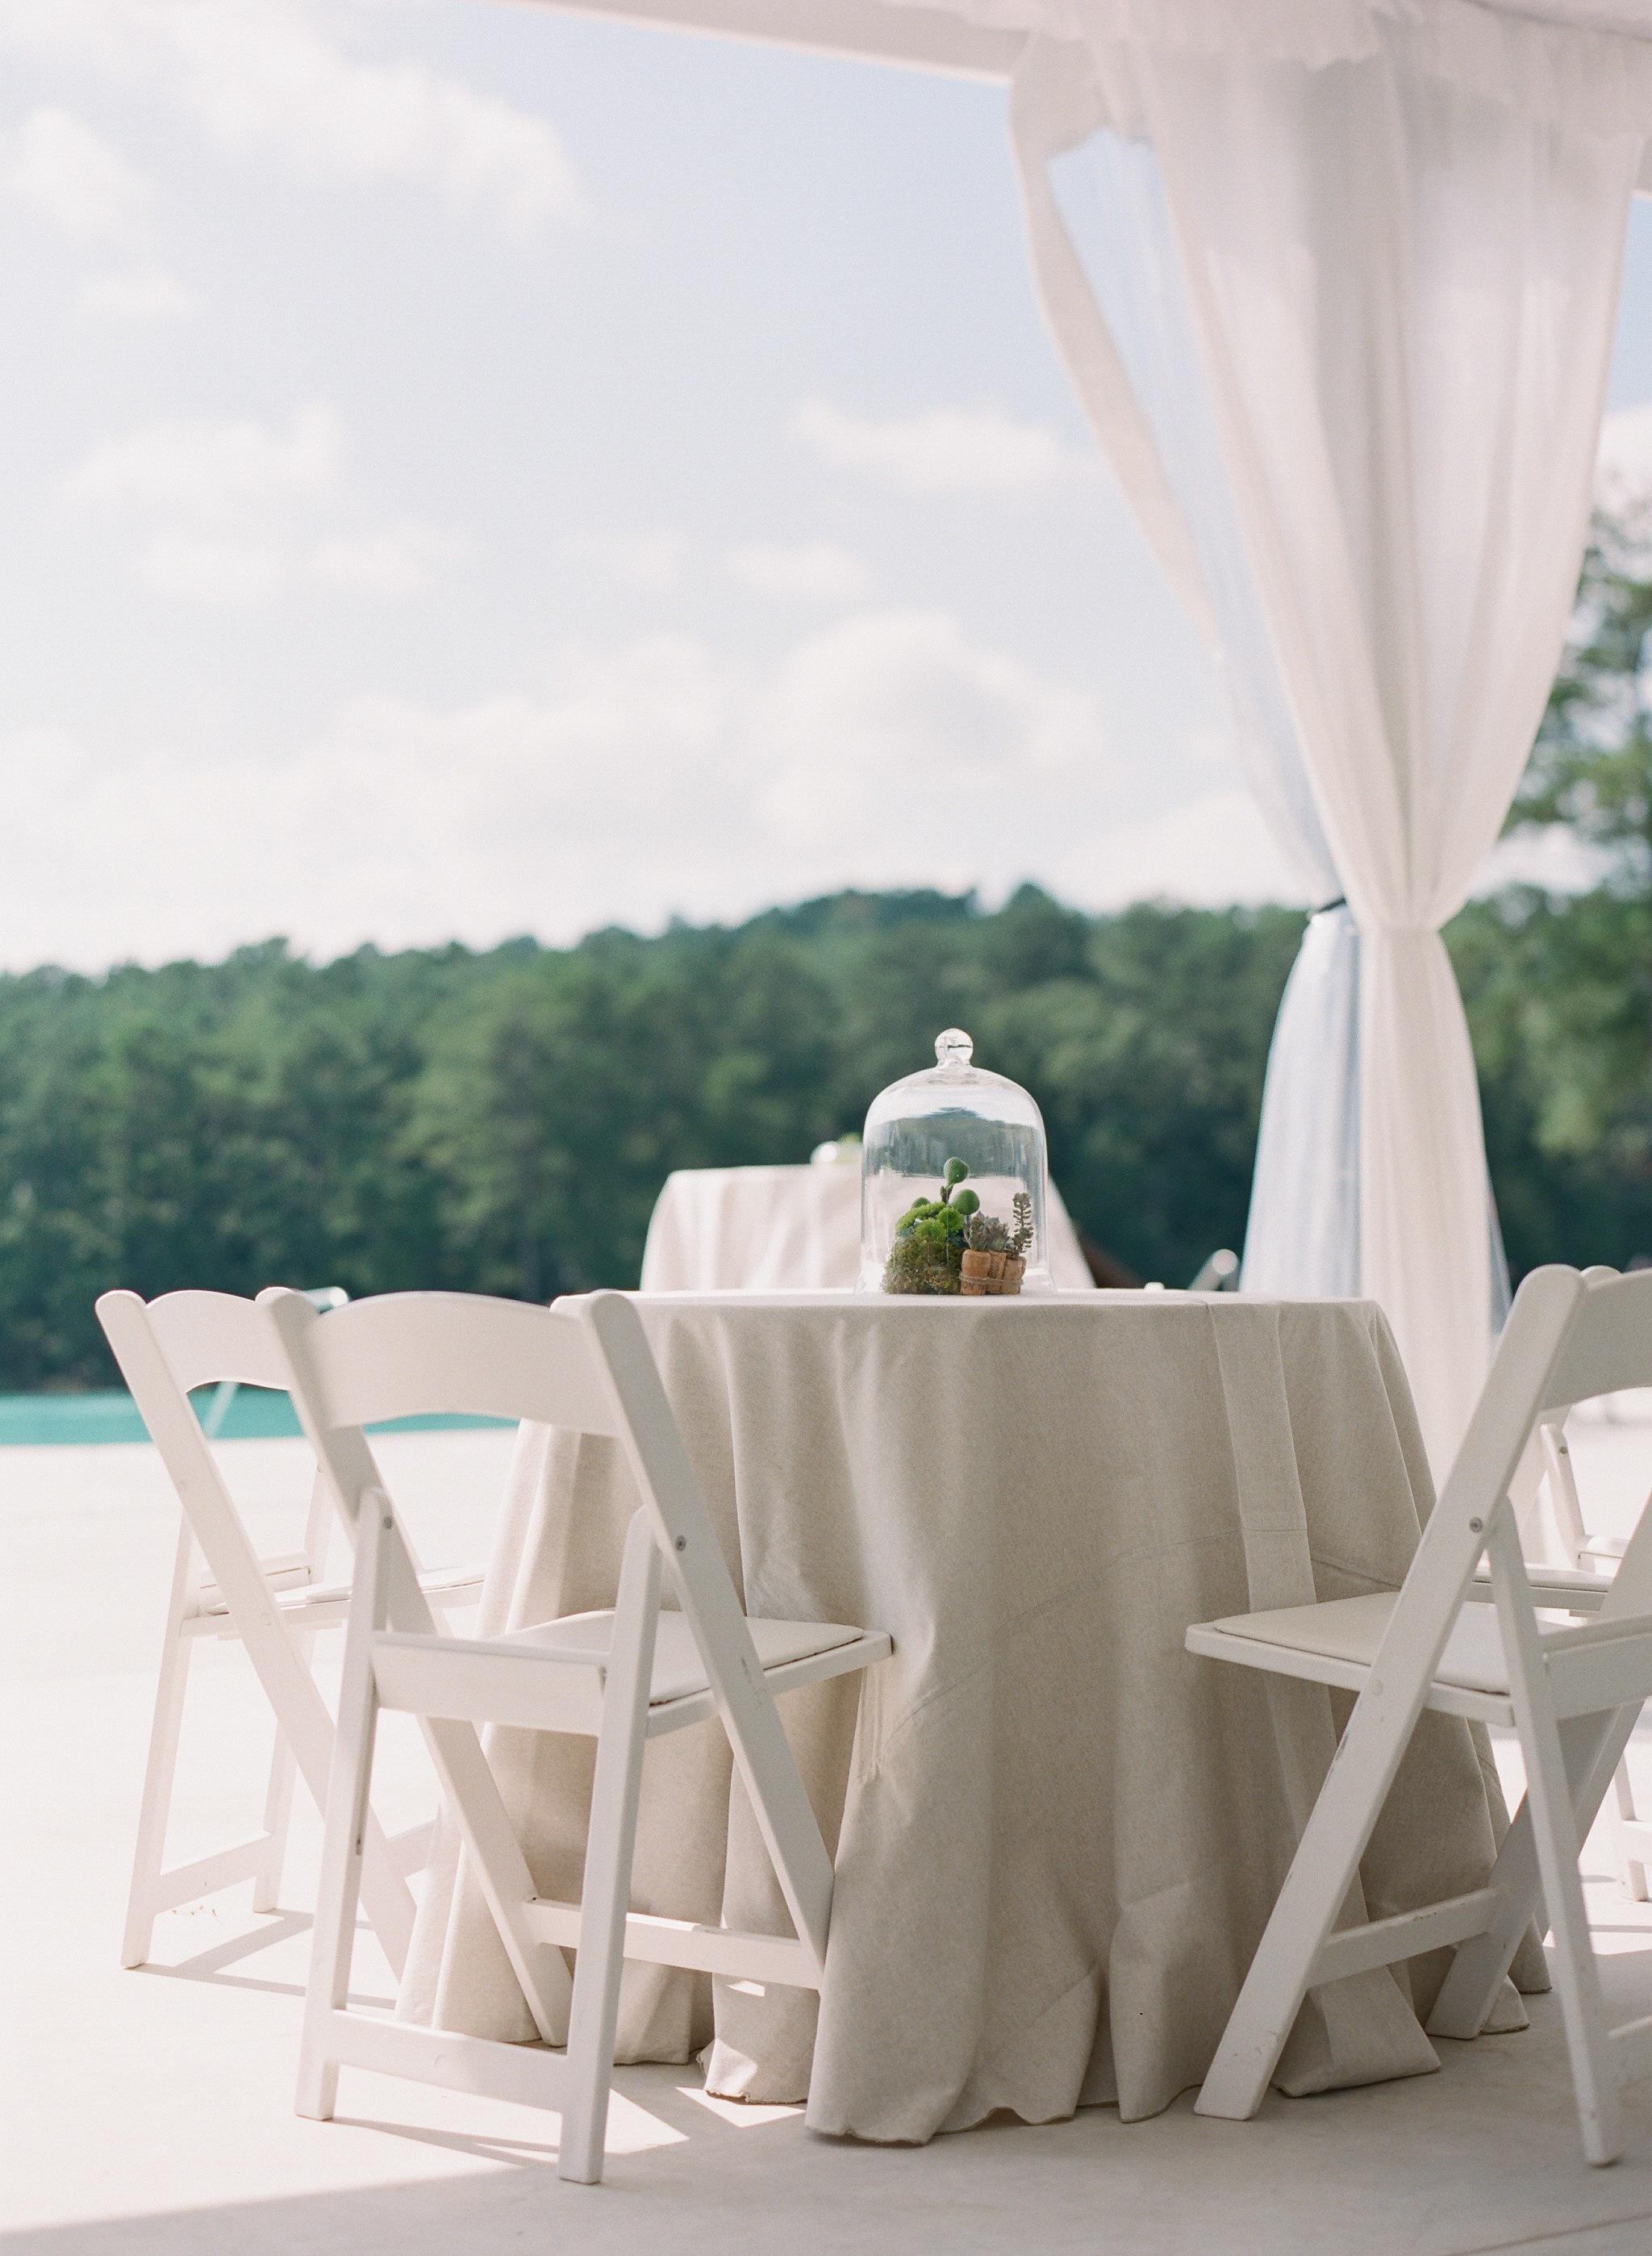 Simply-Charming-Socials_Atlanta-Wedding-Planner_Styled-Photo-Shoot_Modern-Luxury-Brides_Buffy-Dekmar-Photography_Ginny-Branch_Foxhall-Sporting-Club_13.jpg